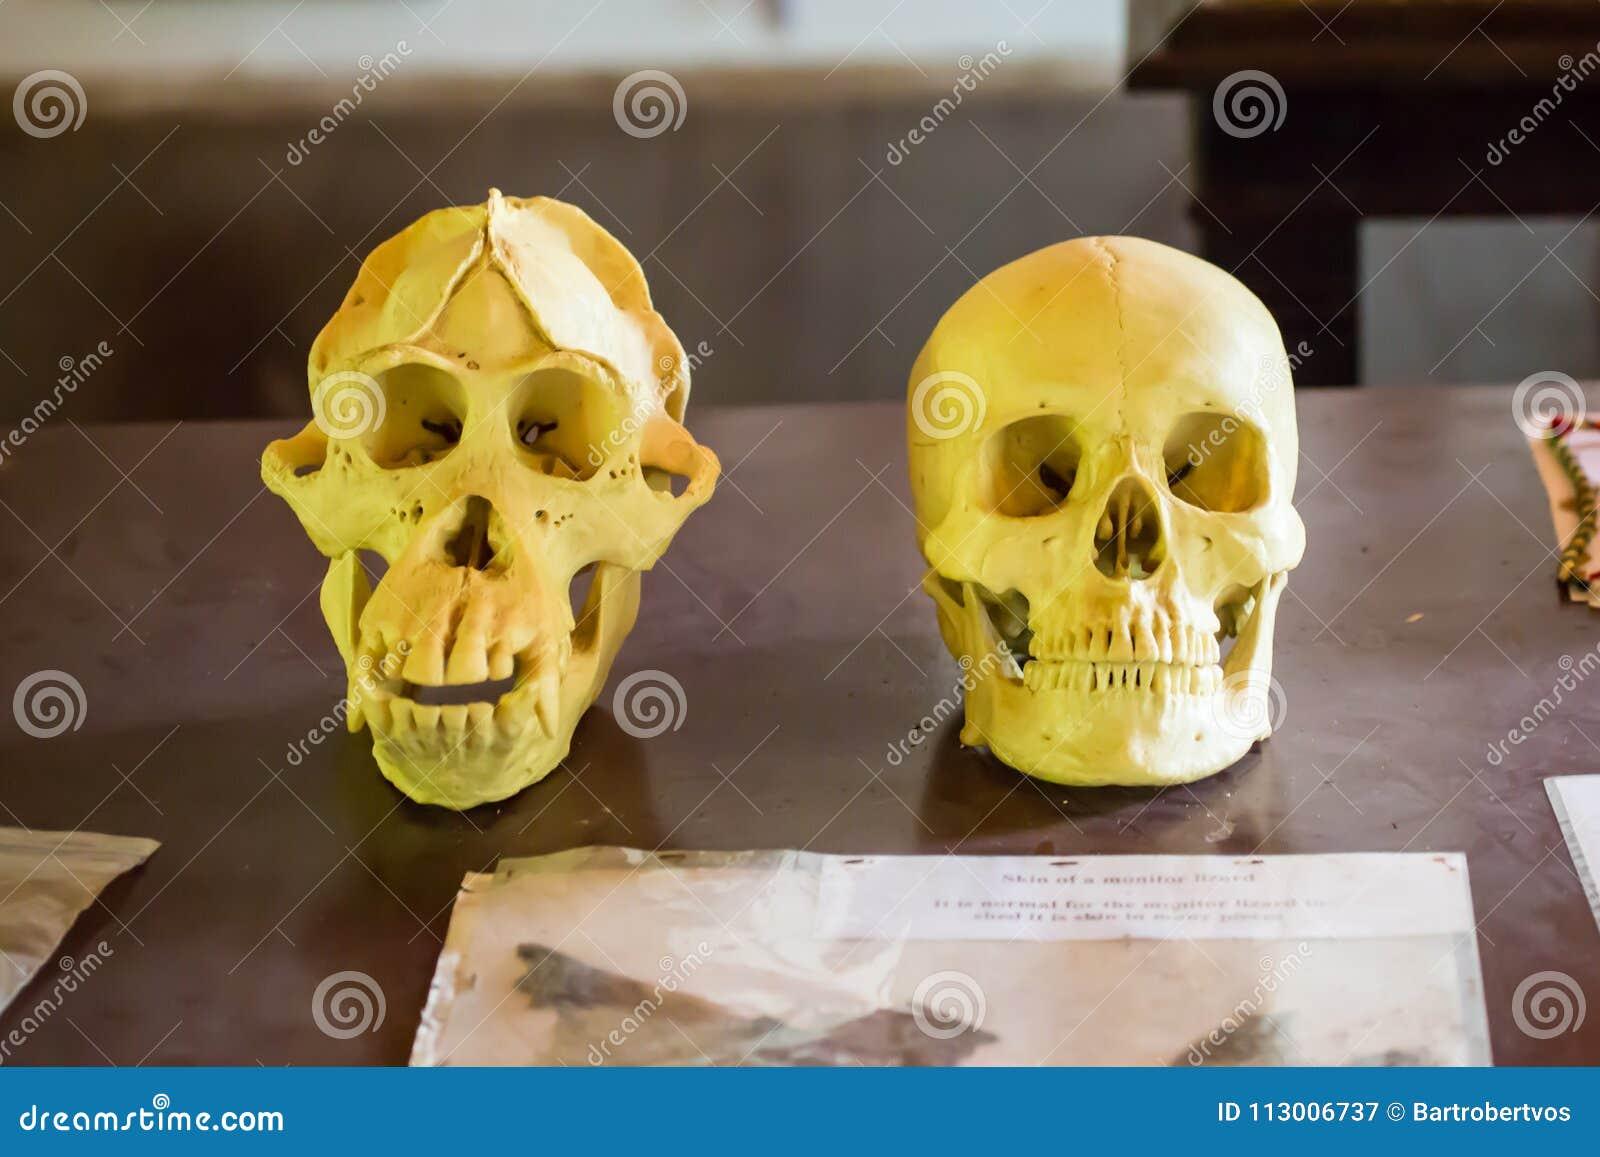 Skulls of human and orangutan the forest in Borneo